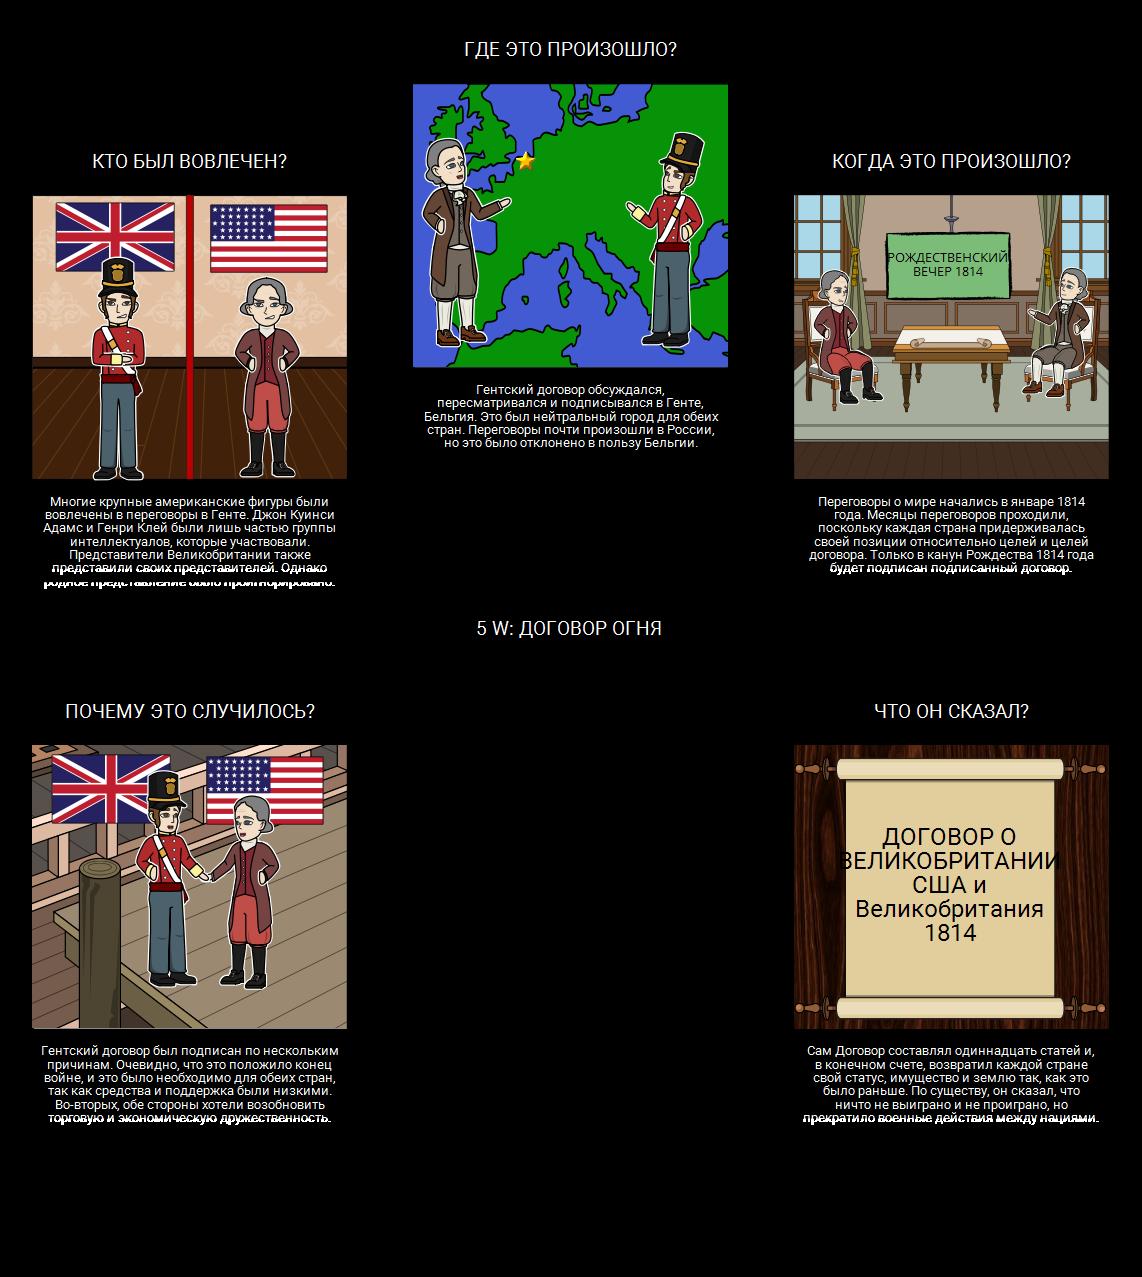 Война 1812 года - 5 Ws Договора Гента